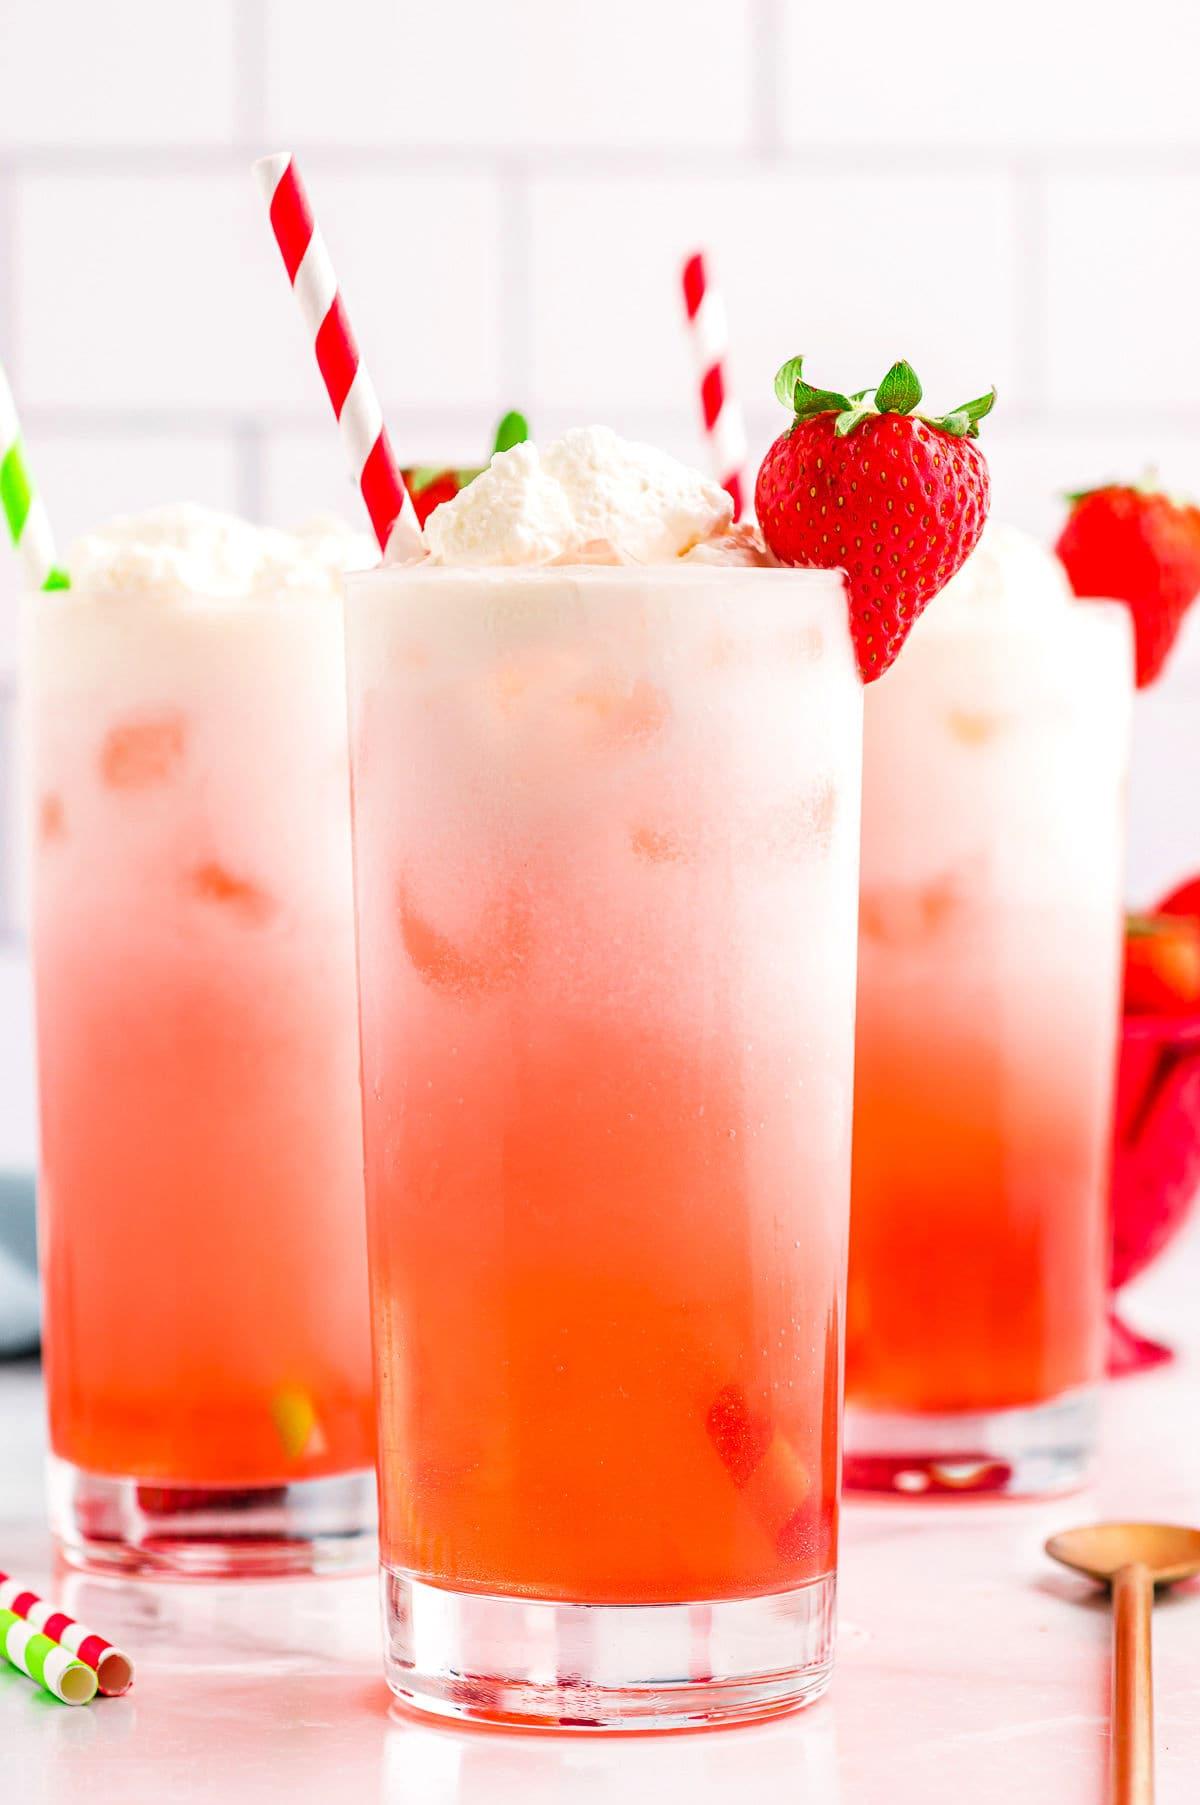 strawberry Italian cream sodas in tall beverage glass with paper straws.